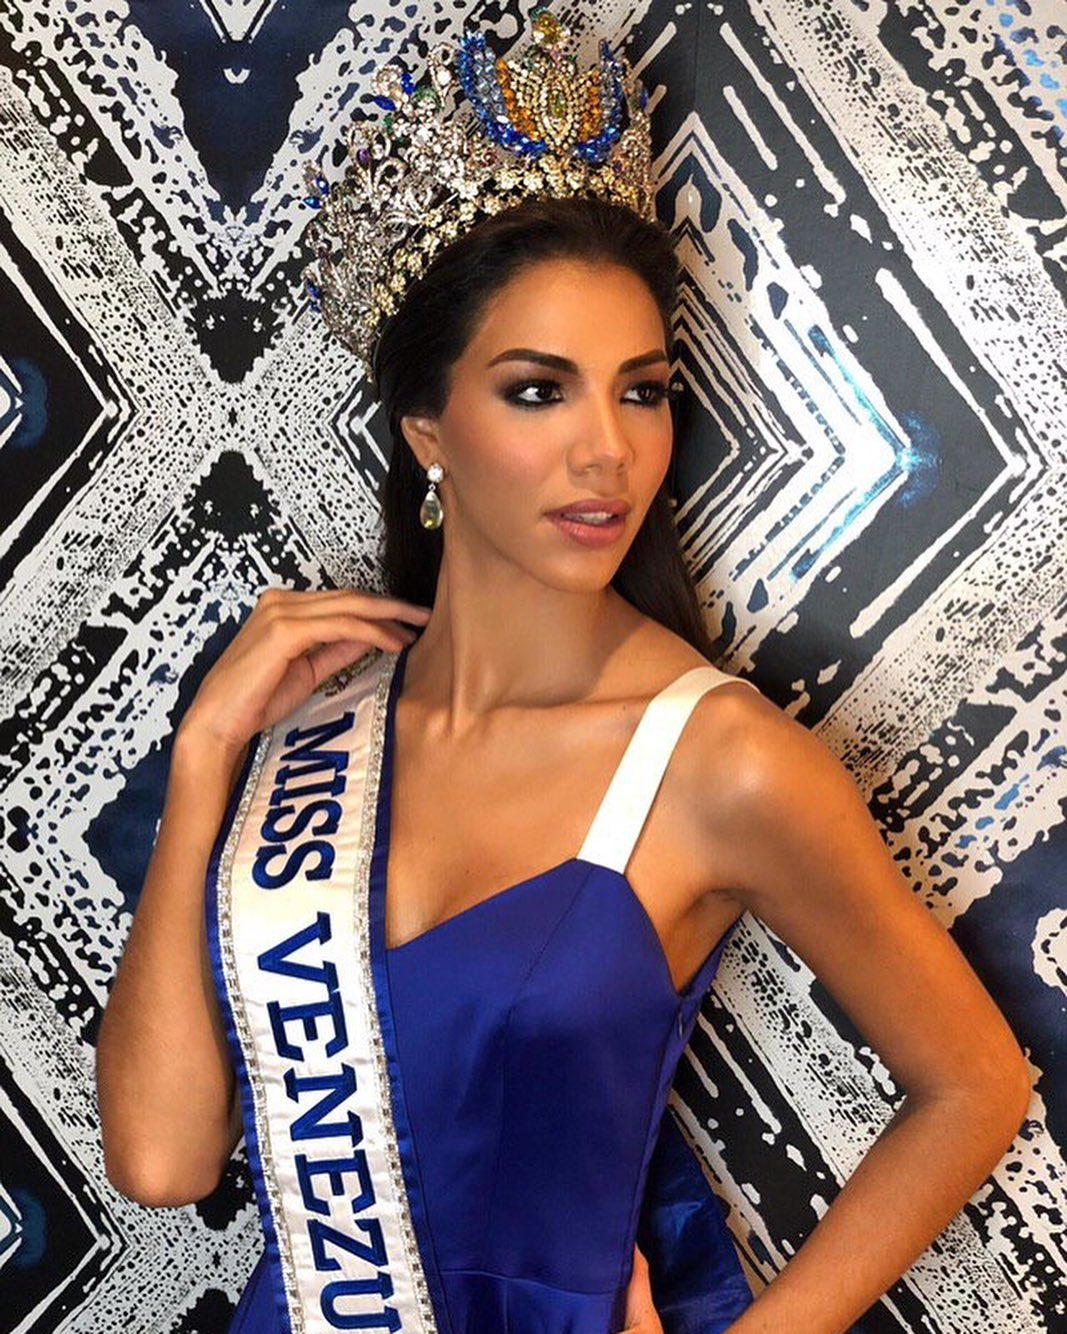 thalia olvino, top 20 de miss universe 2019. - Página 2 72578610